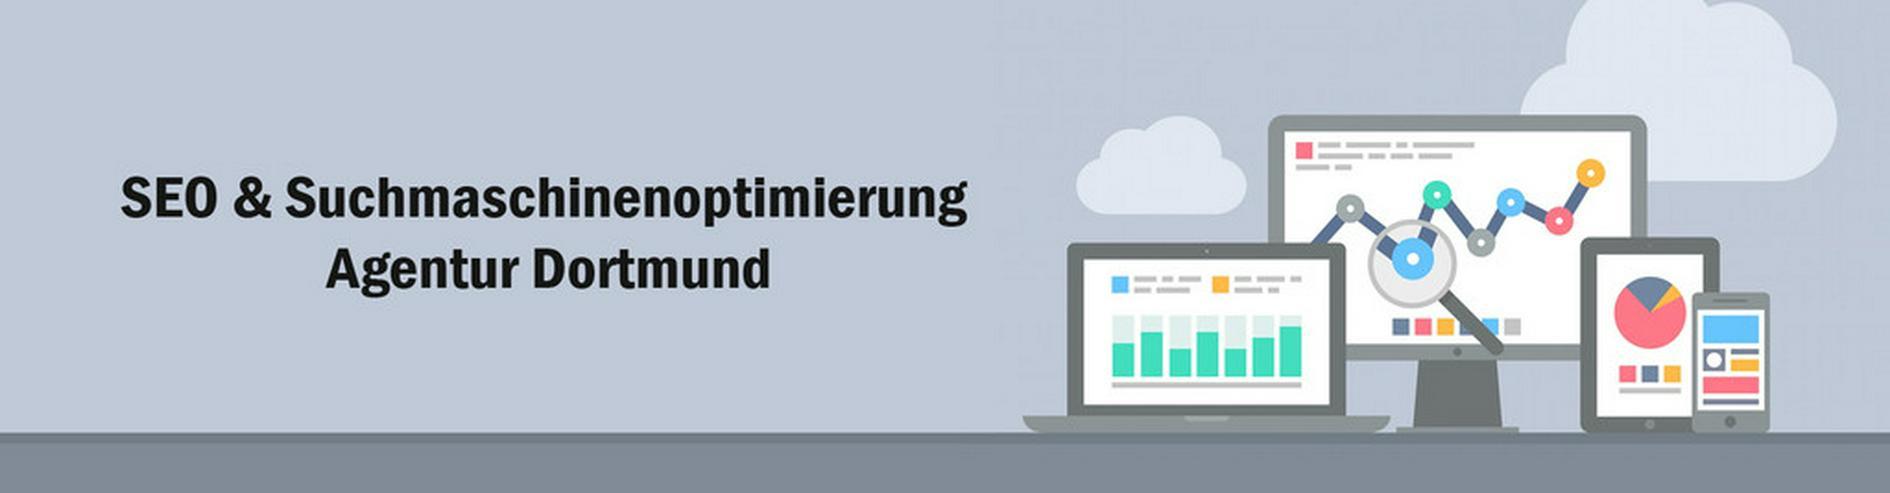 Bild 5: Suchmaschinenoptimierung Frankfurt am Main